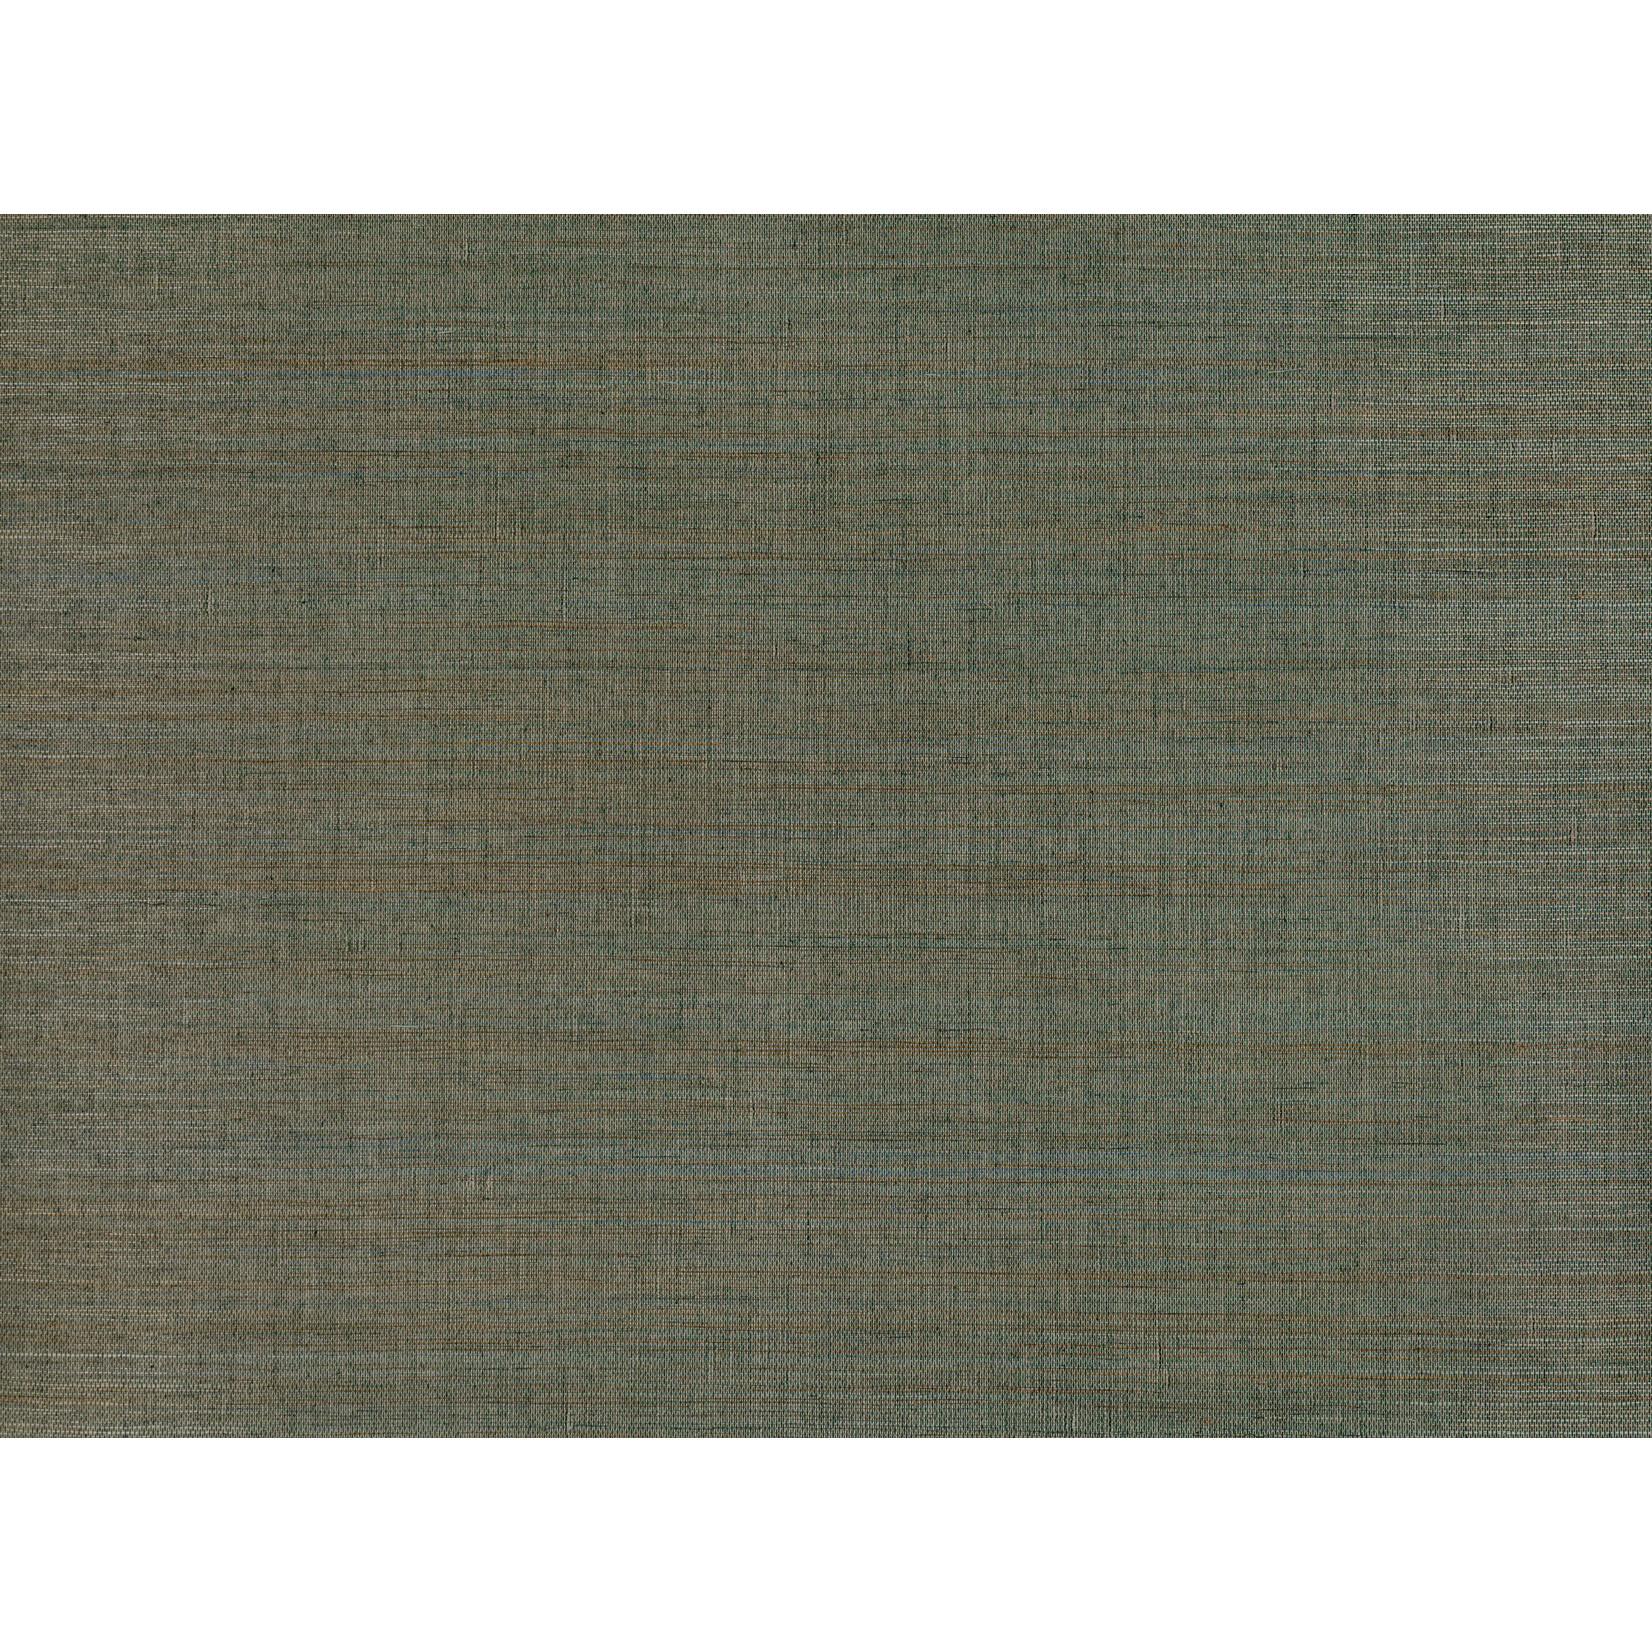 Mark Alexander Grasscloth Handwoven Wallcoverings | Duo Sisal Pimento